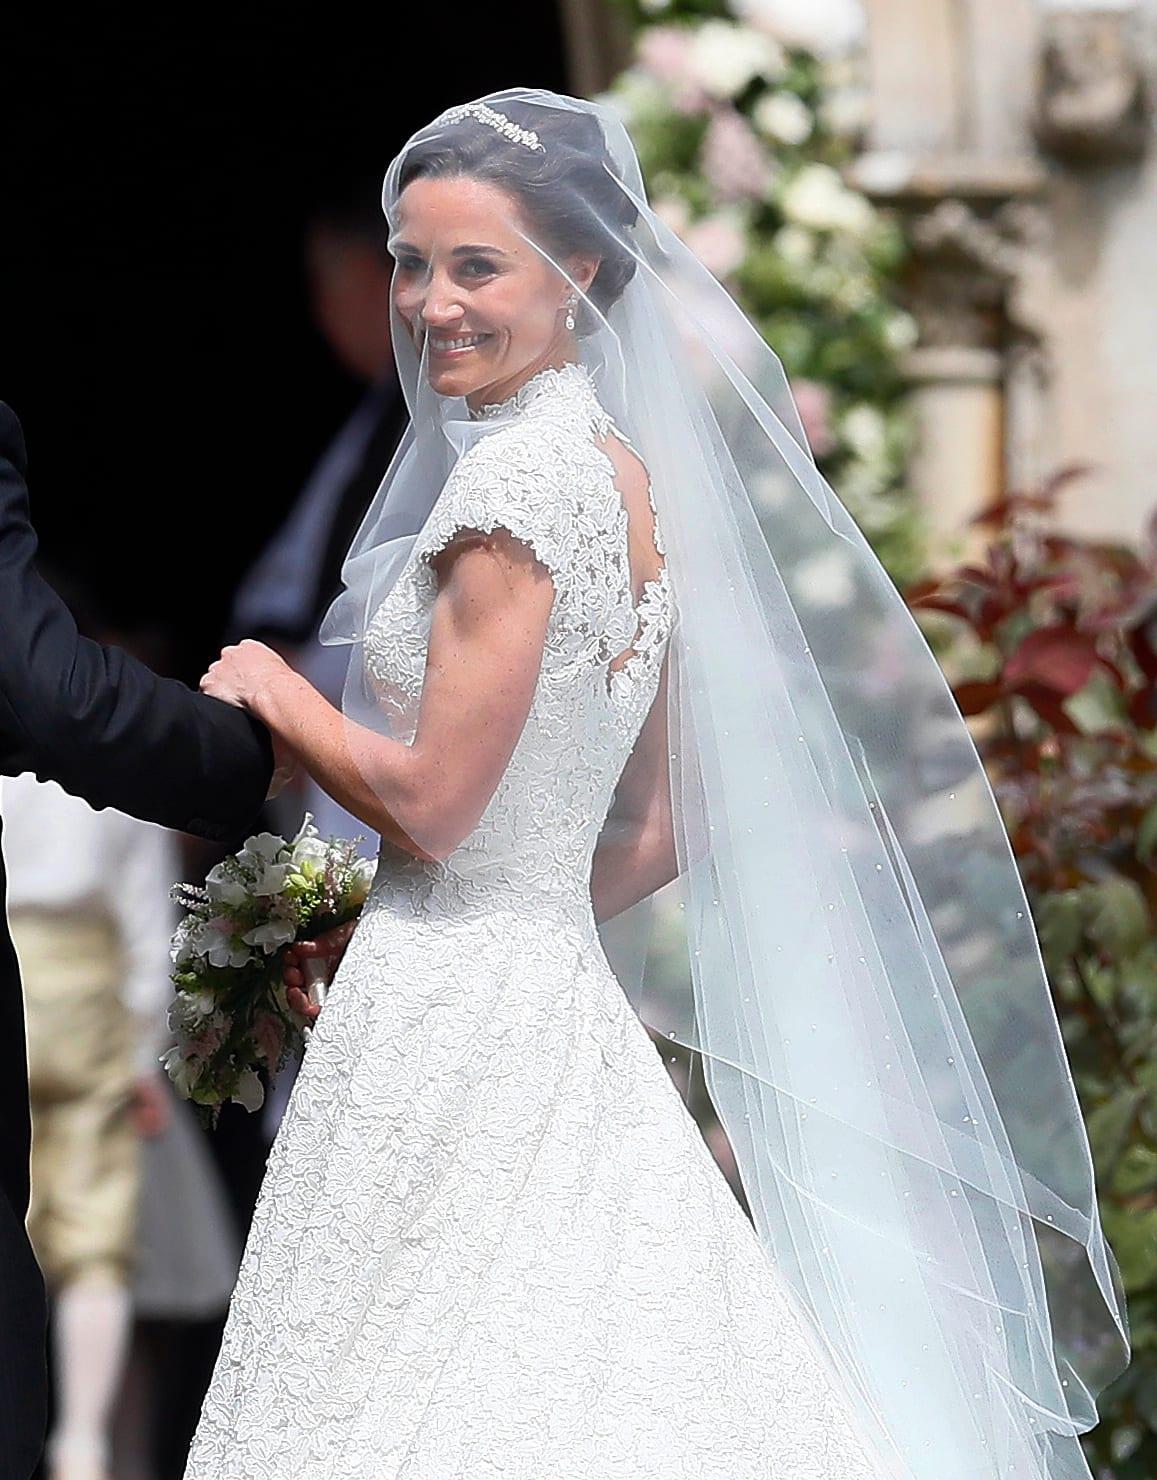 Pippa Wedding Dress.Pippa Middleton Vs Kate Middleton Who Wore Her Wedding Dress